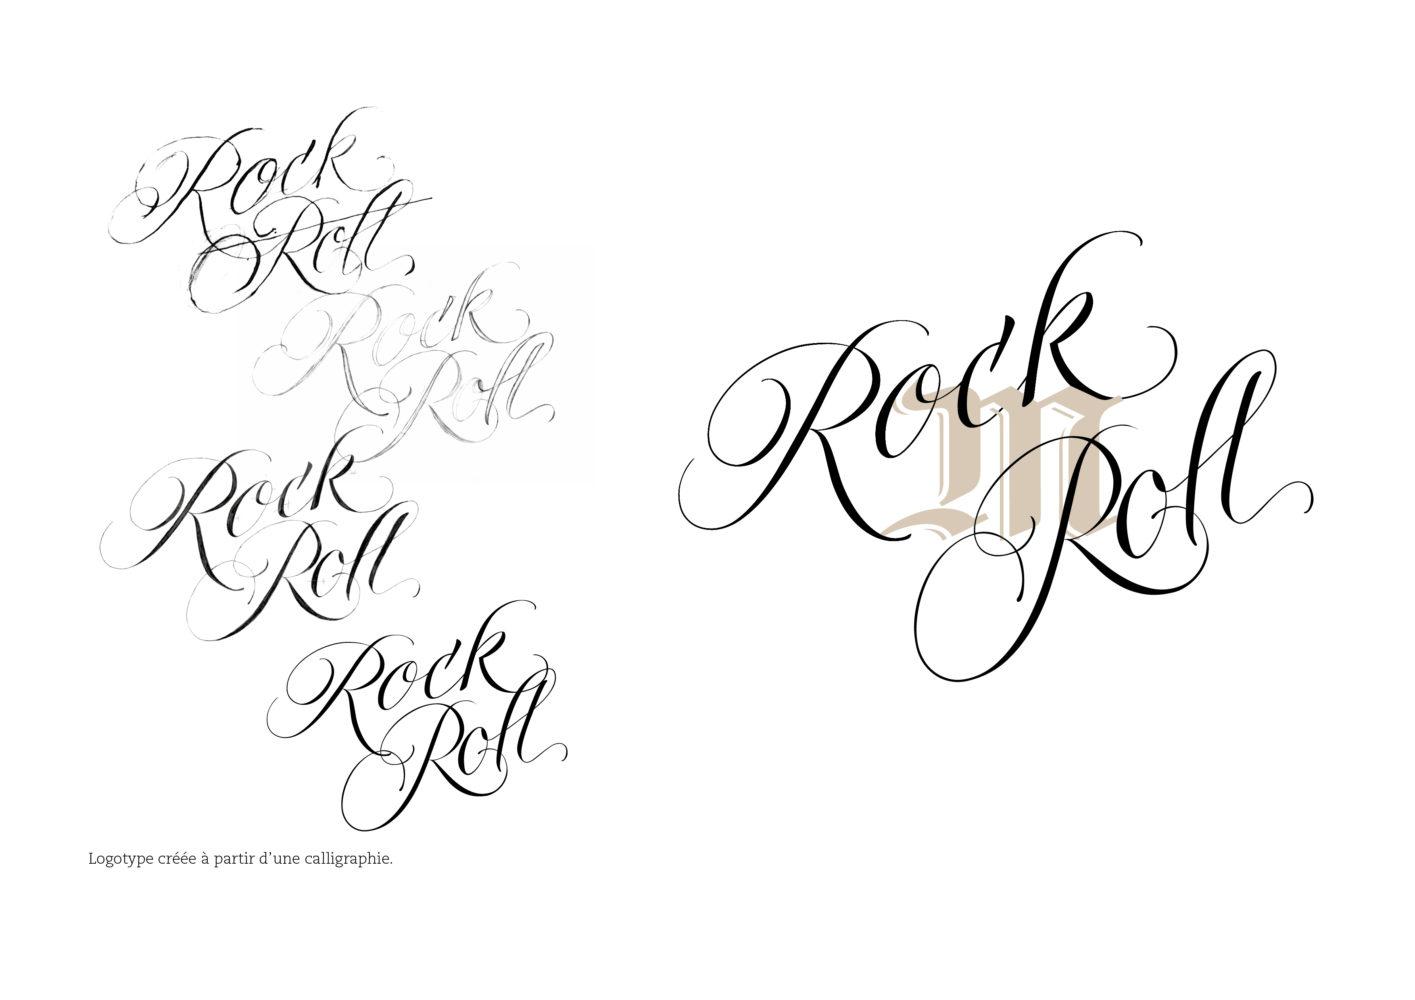 AA-WP-Graphisme-Logotype-RockNRoll